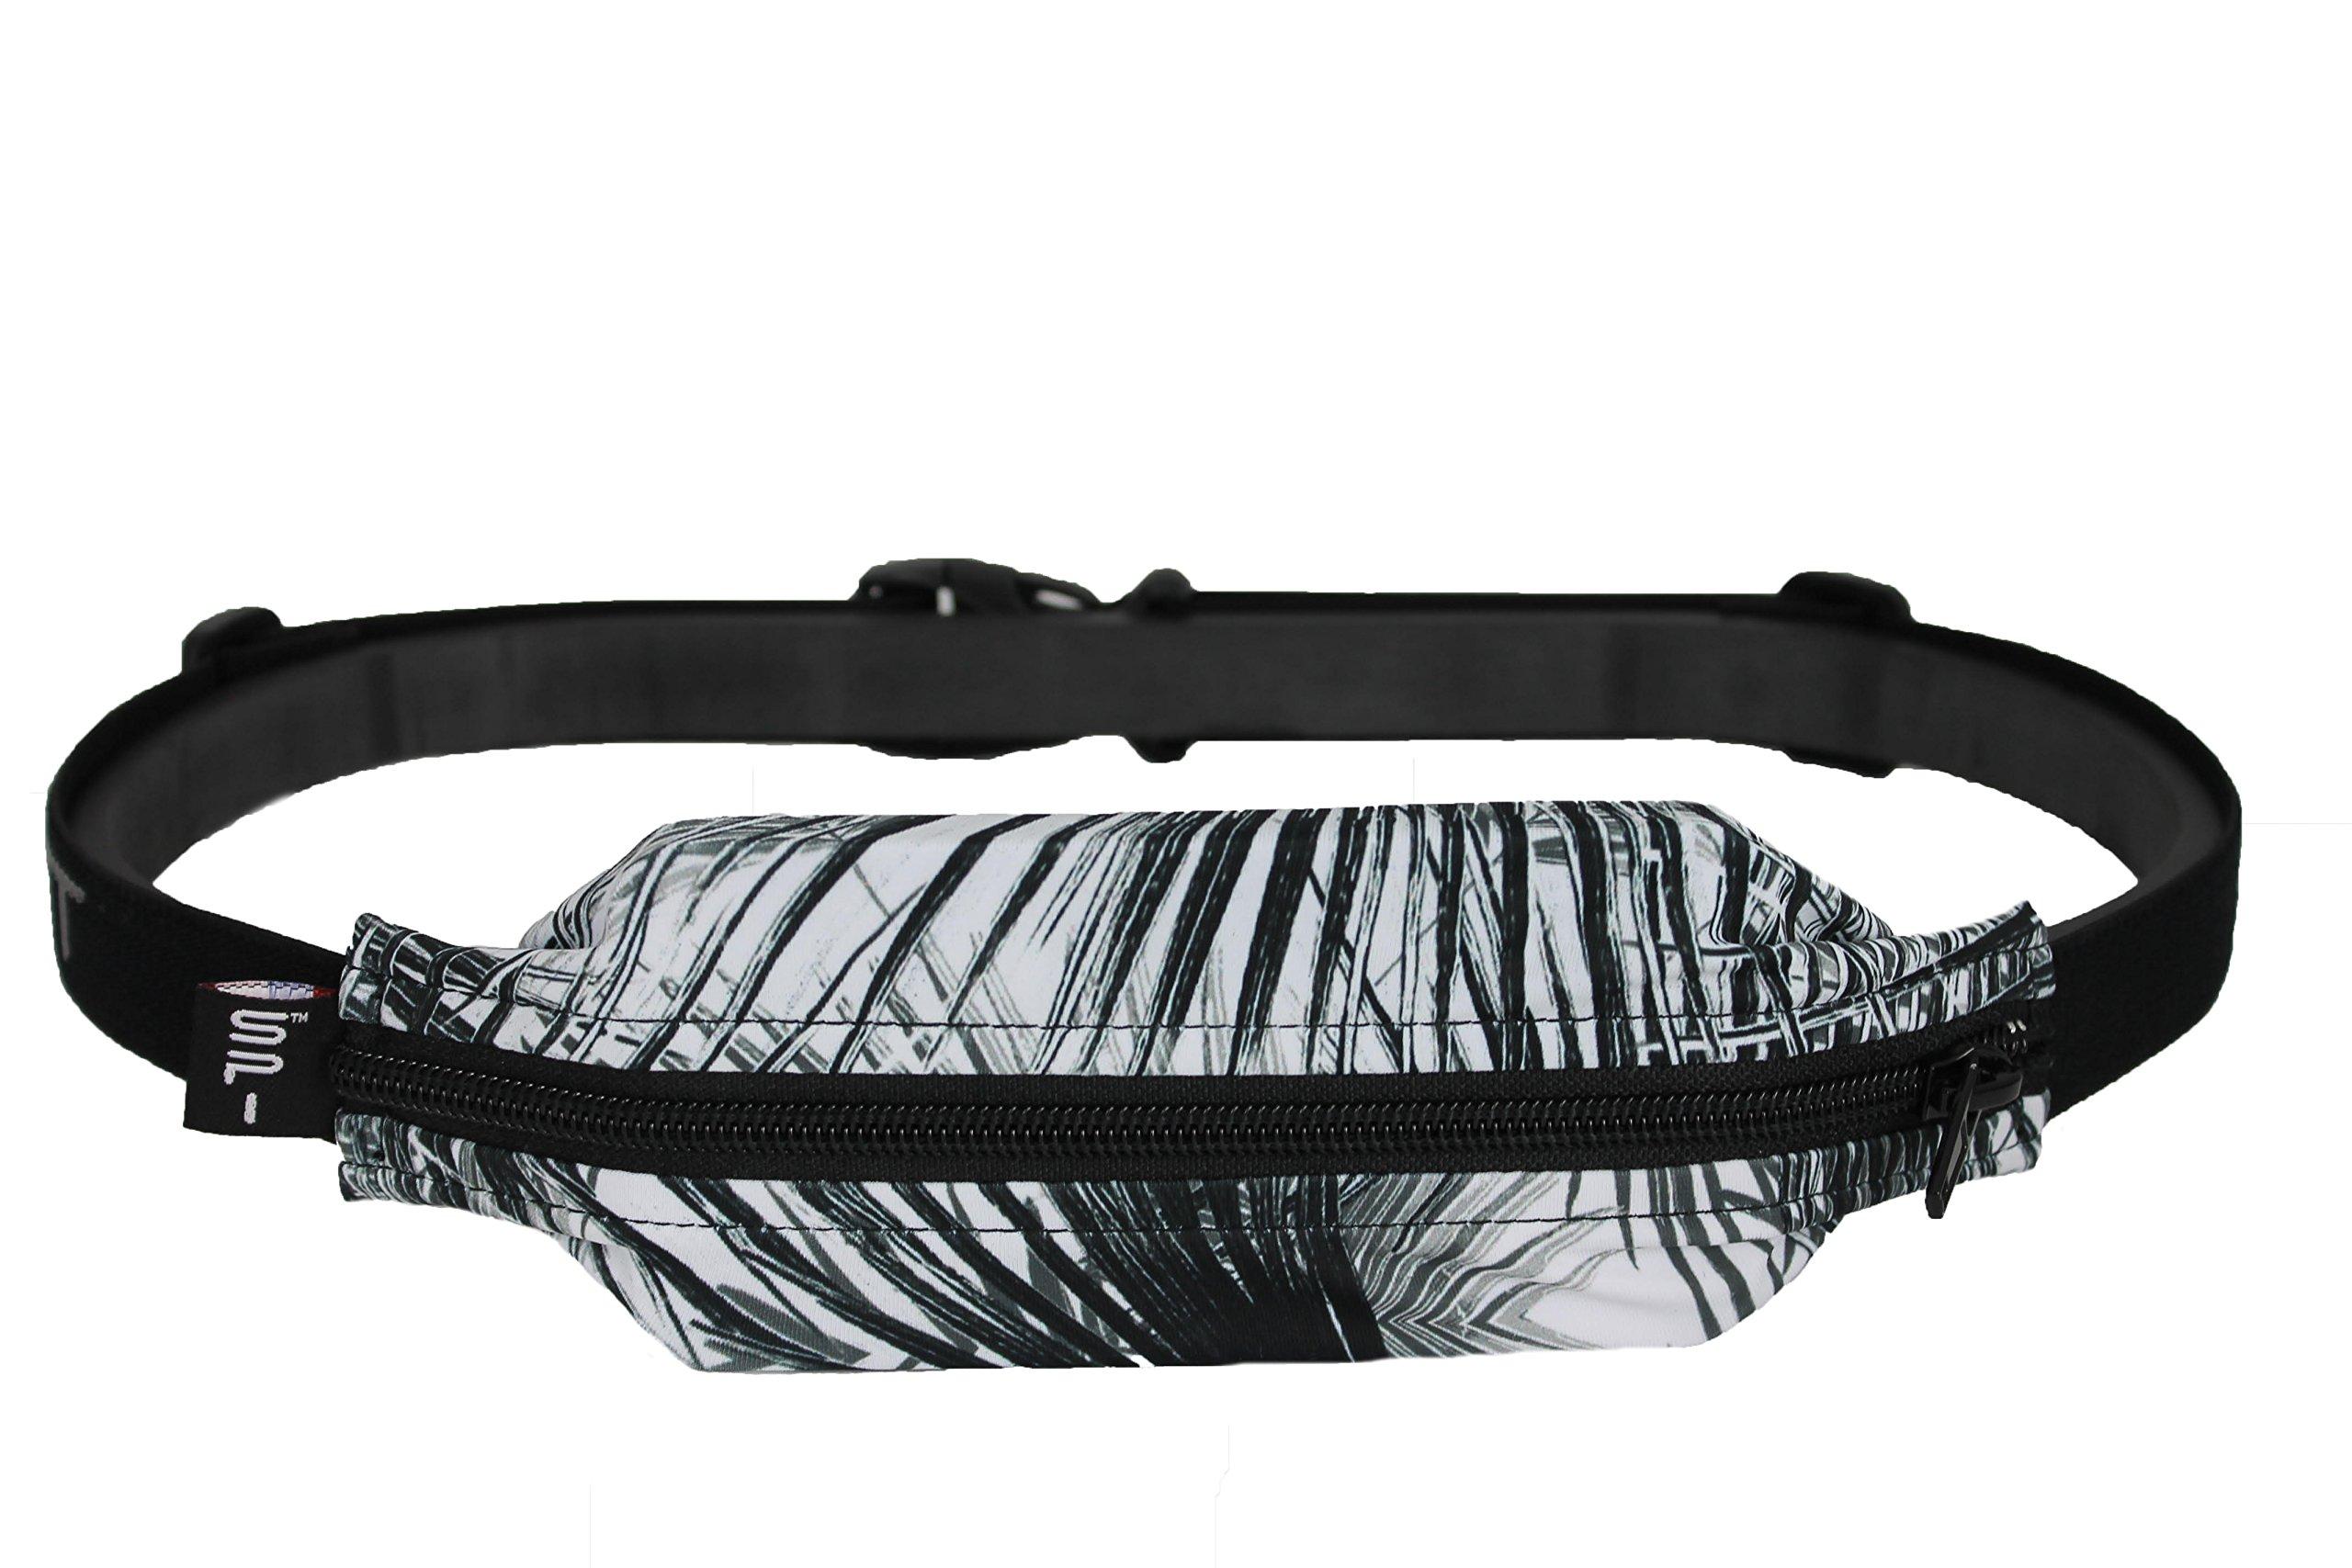 SPIbelt Running Belt: Adult Large Pocket - No-Bounce Running Belt for Runners, Athletes and Adventurers (Palm with Black Zipper, 25'' Through 47'')